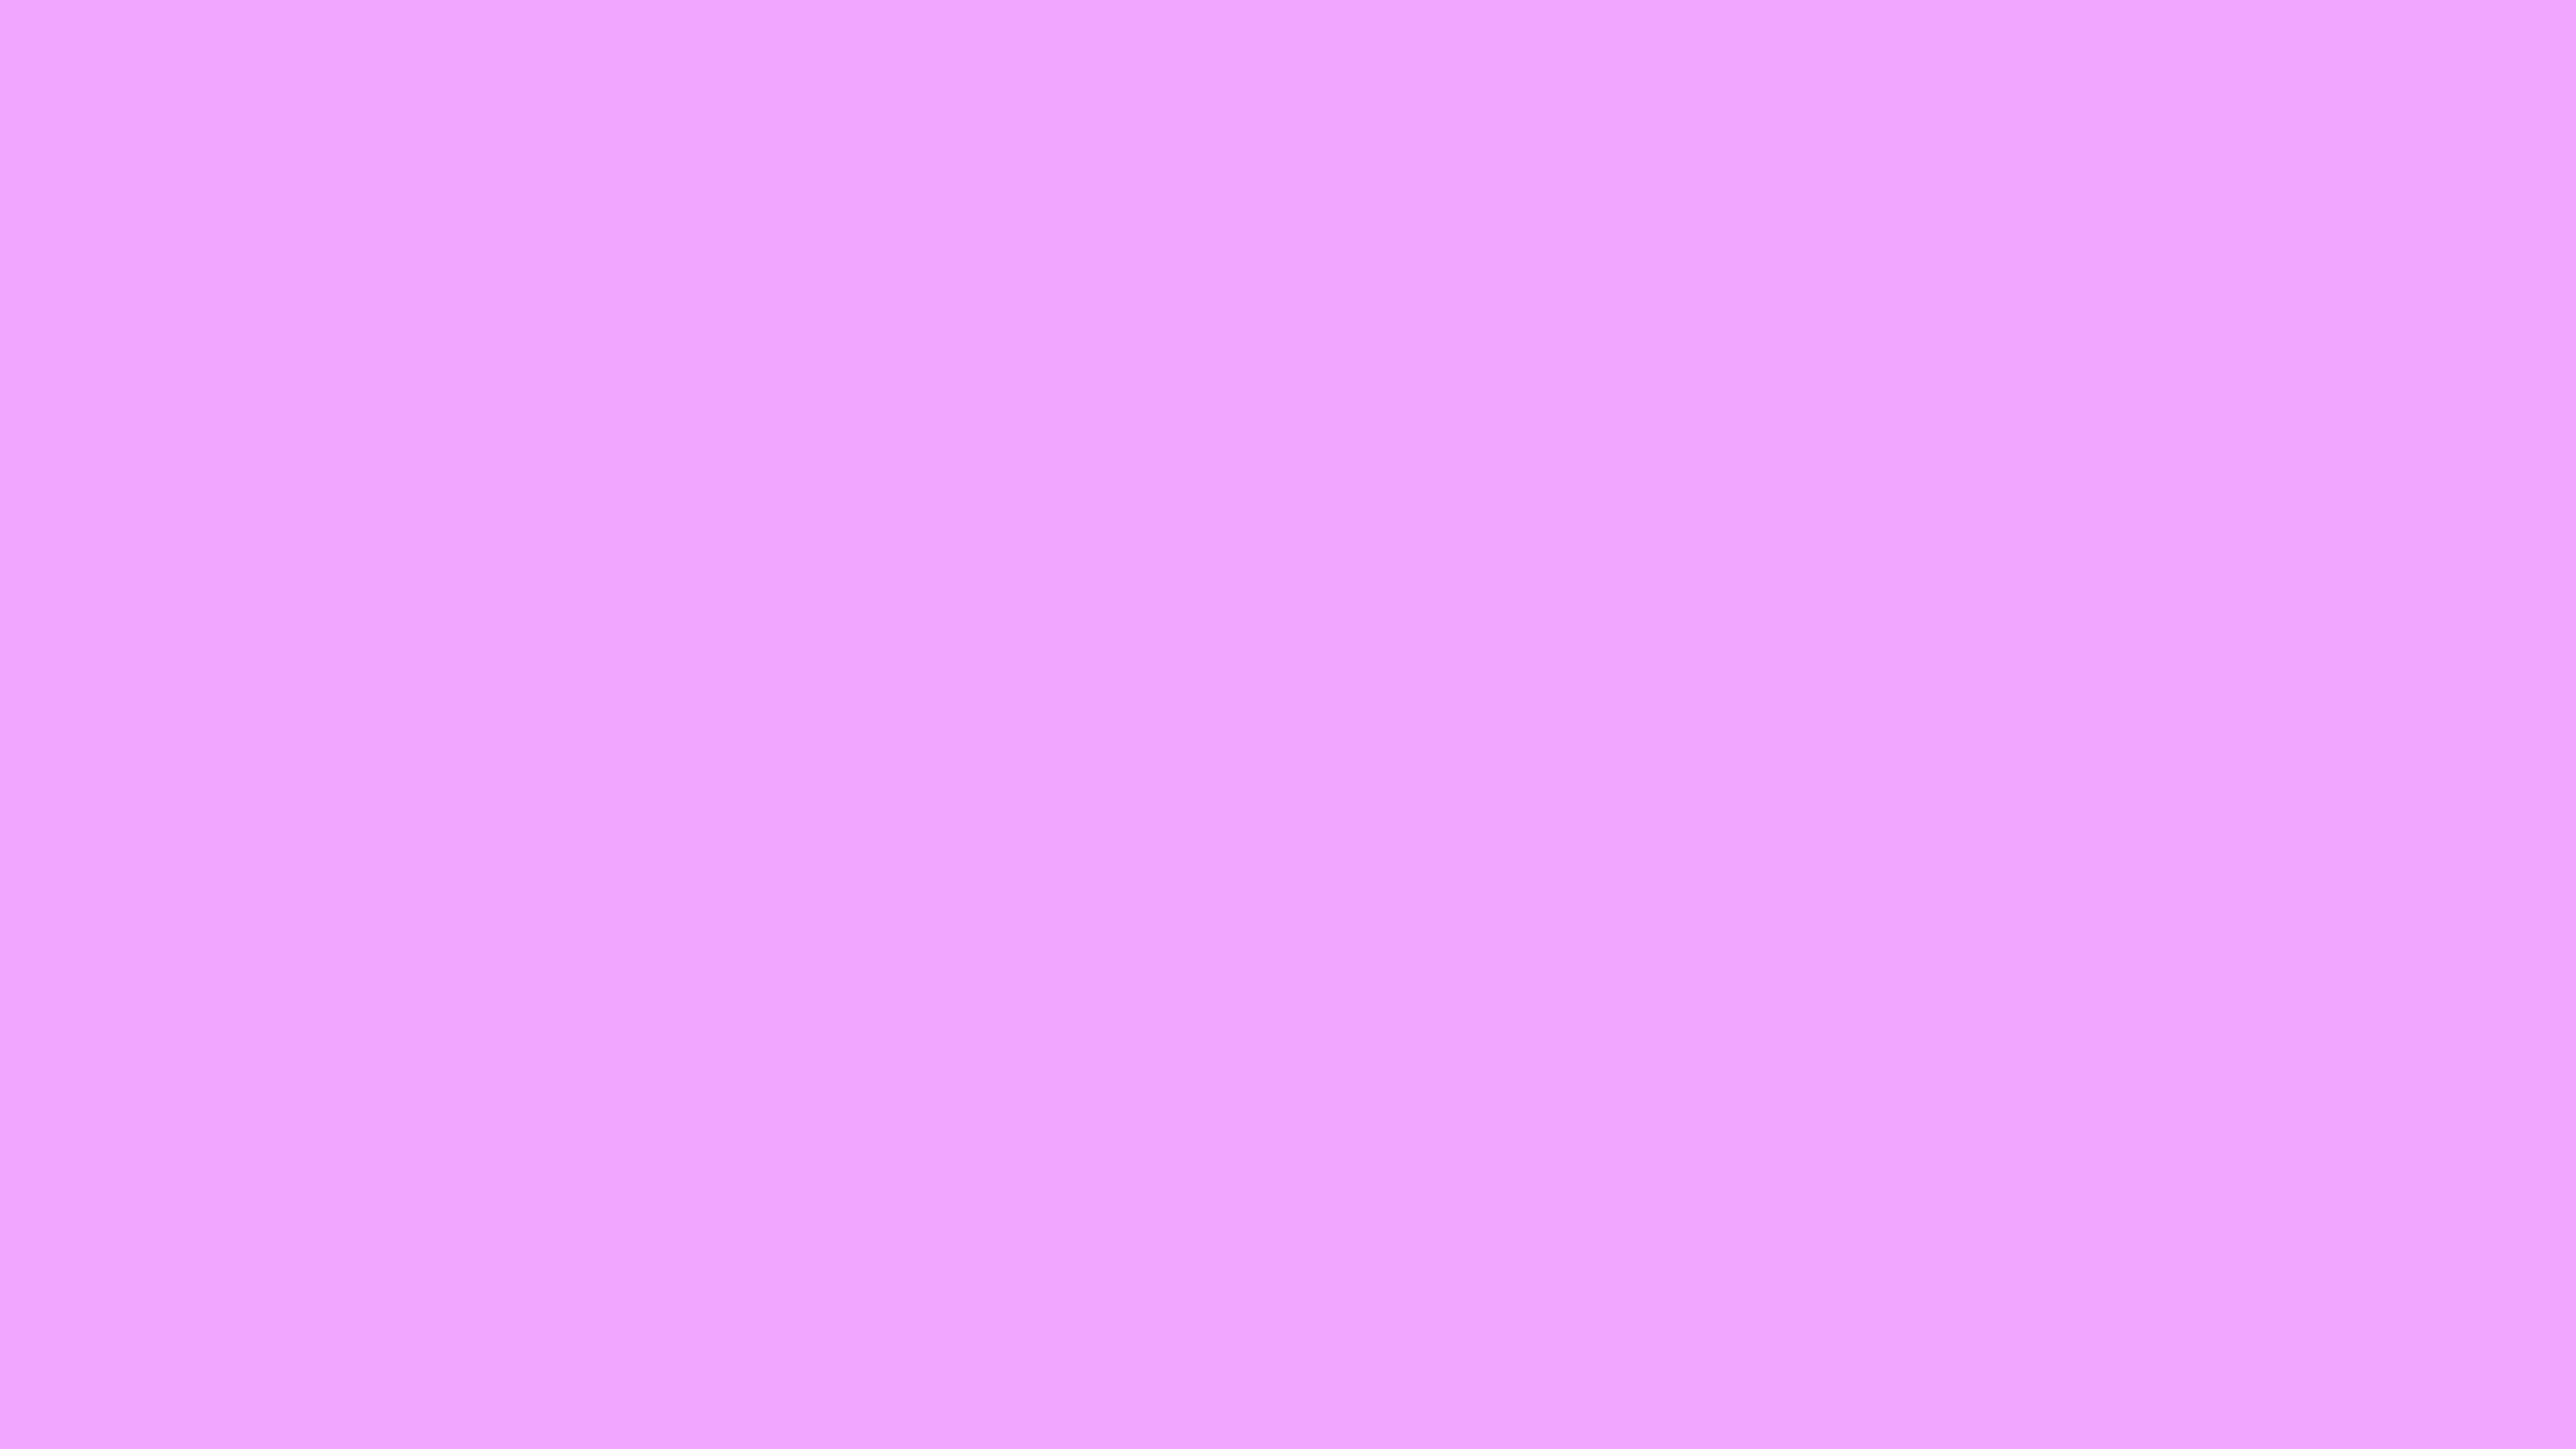 7680x4320 Rich Brilliant Lavender Solid Color Background